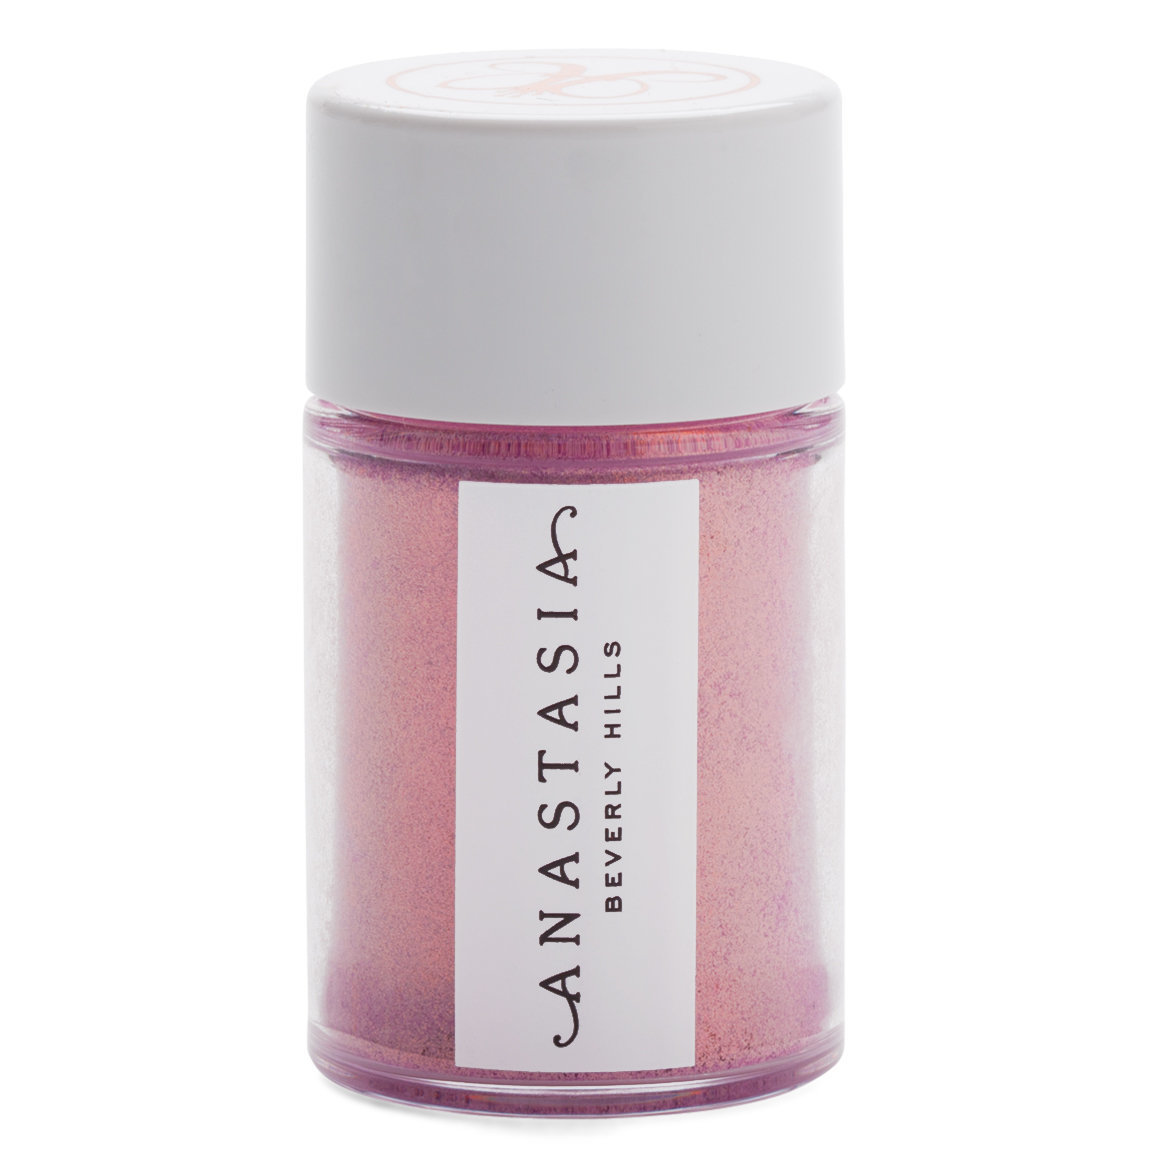 Anastasia Beverly Hills Loose Pigment Daiquiri product swatch.